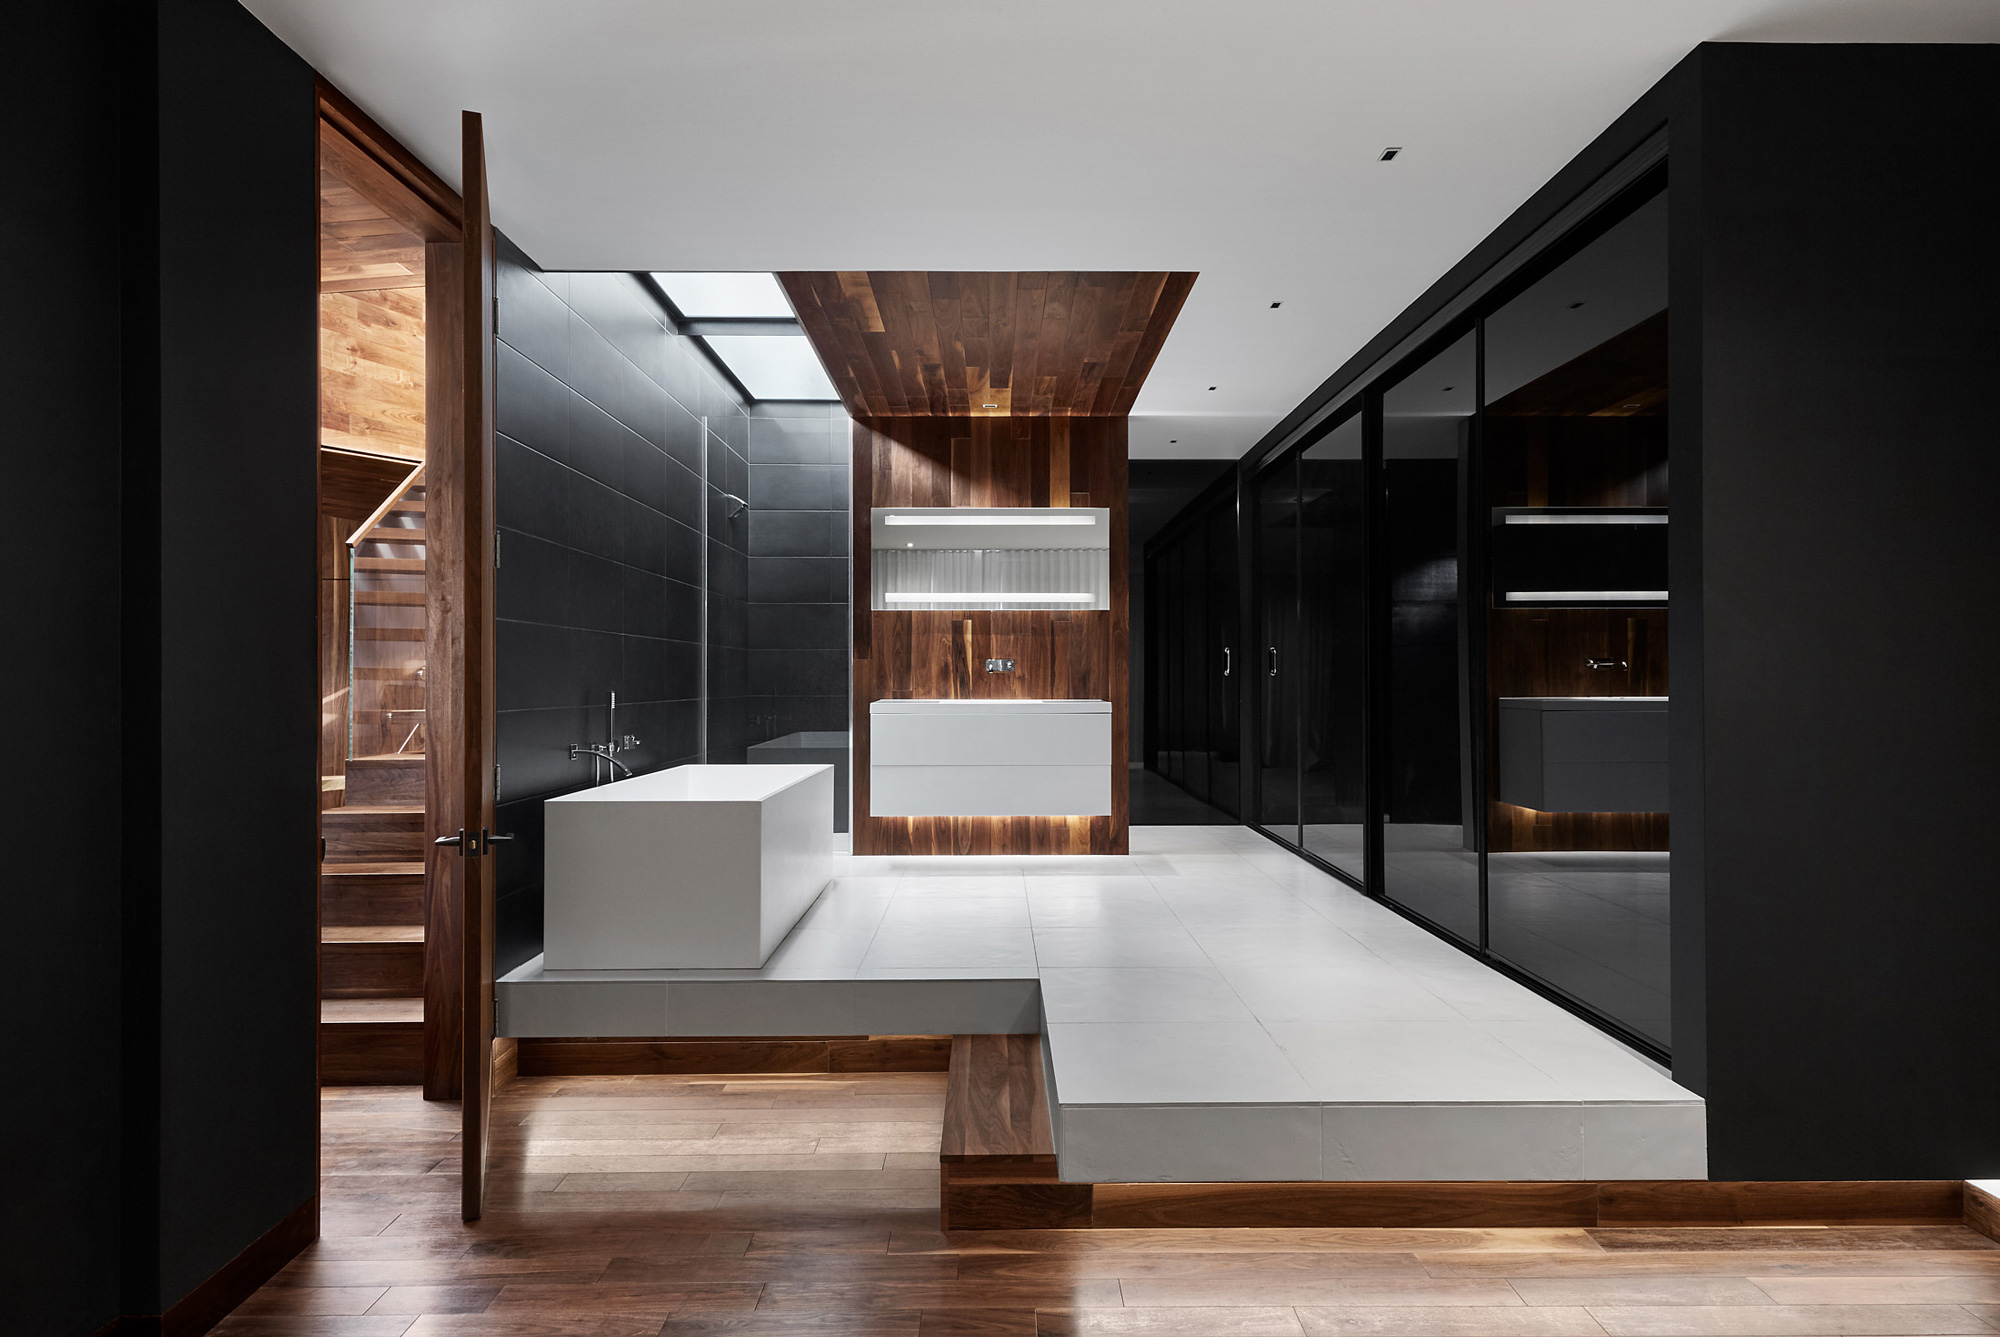 Salle de bain murs noirs noyer